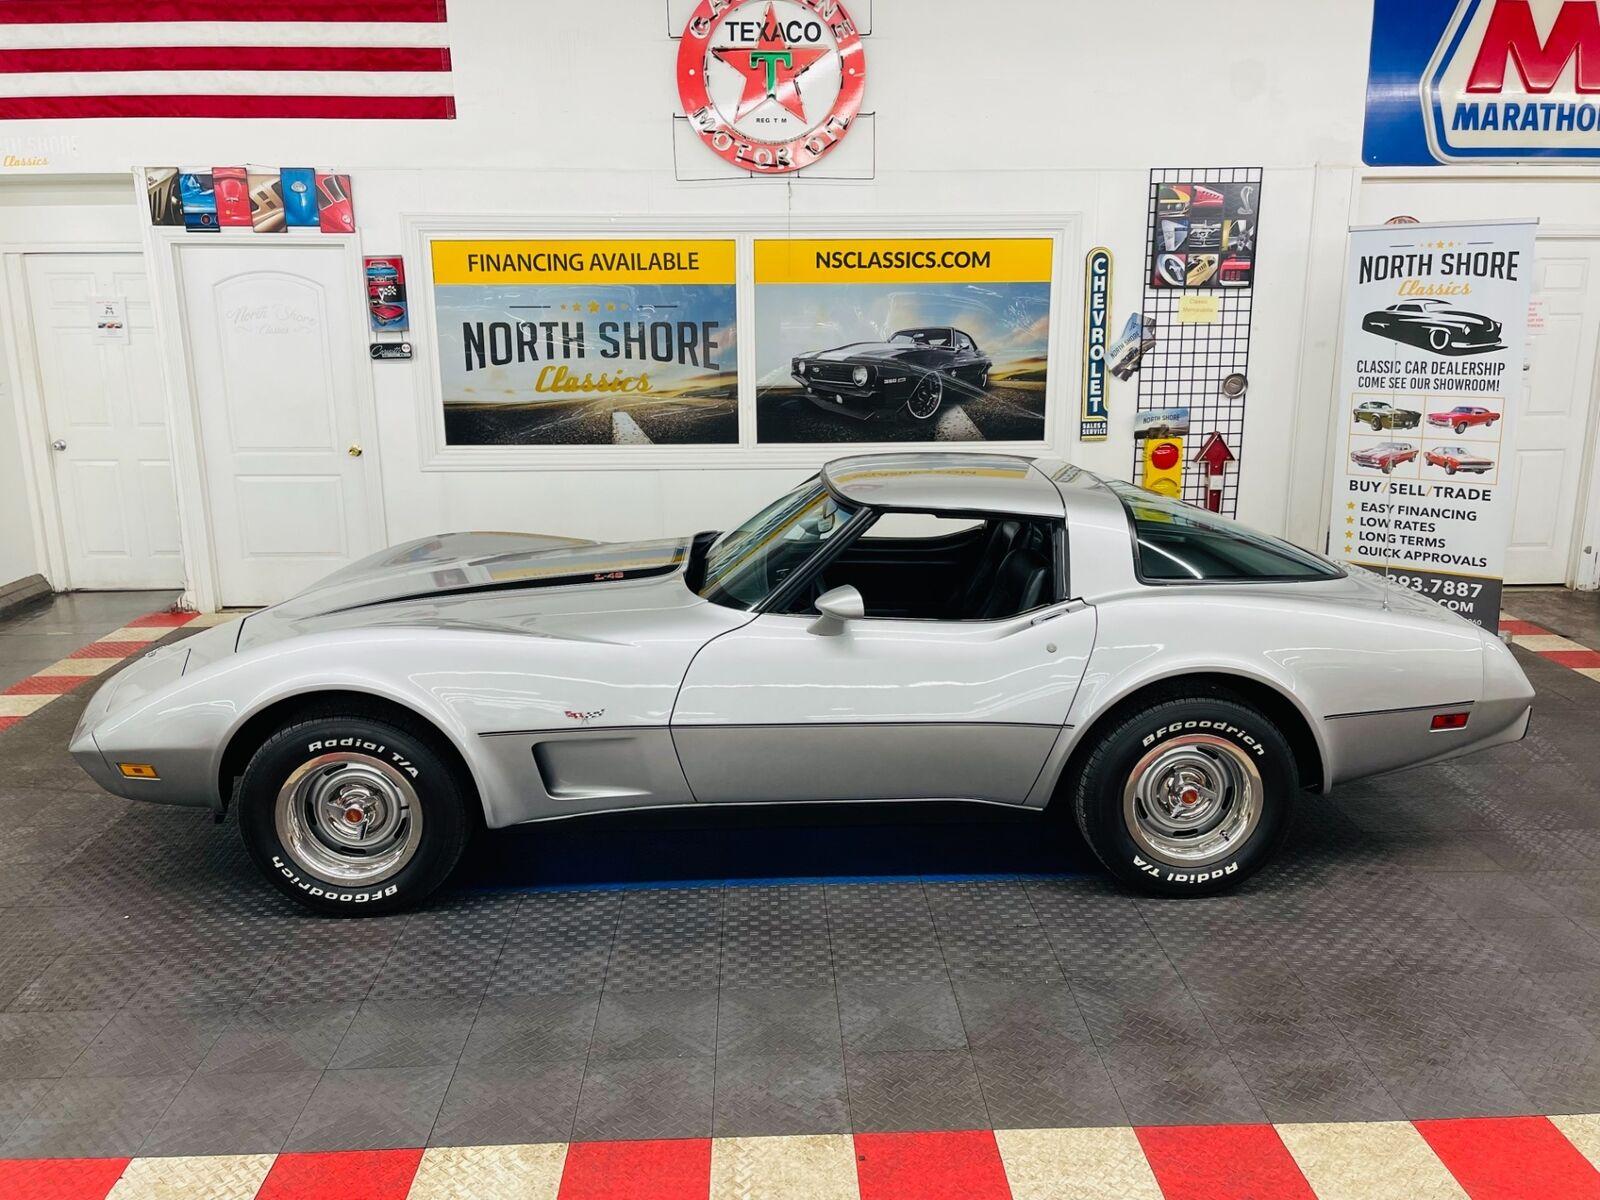 1979 Silver Chevrolet Corvette   | C3 Corvette Photo 4